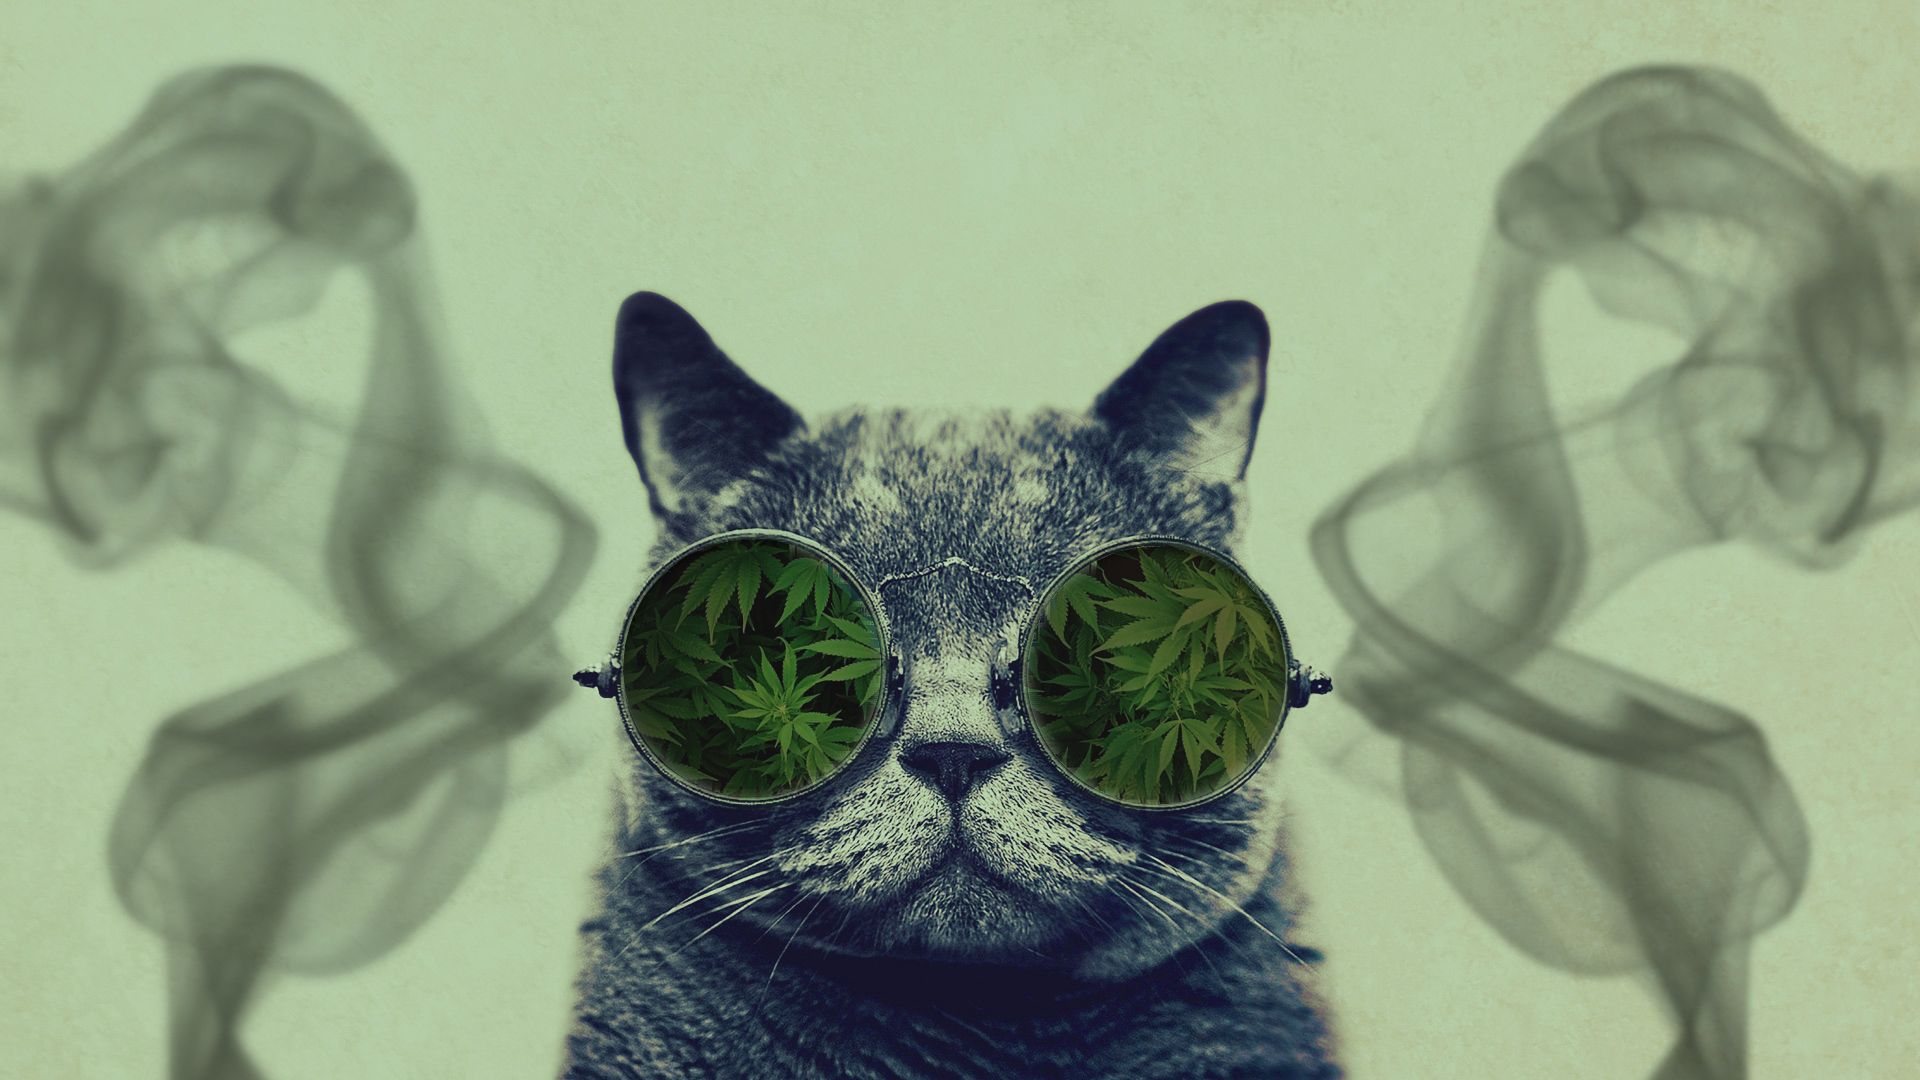 Cat With Galaxy Glasses Wallpaper Hd Www Bilderbeste Com